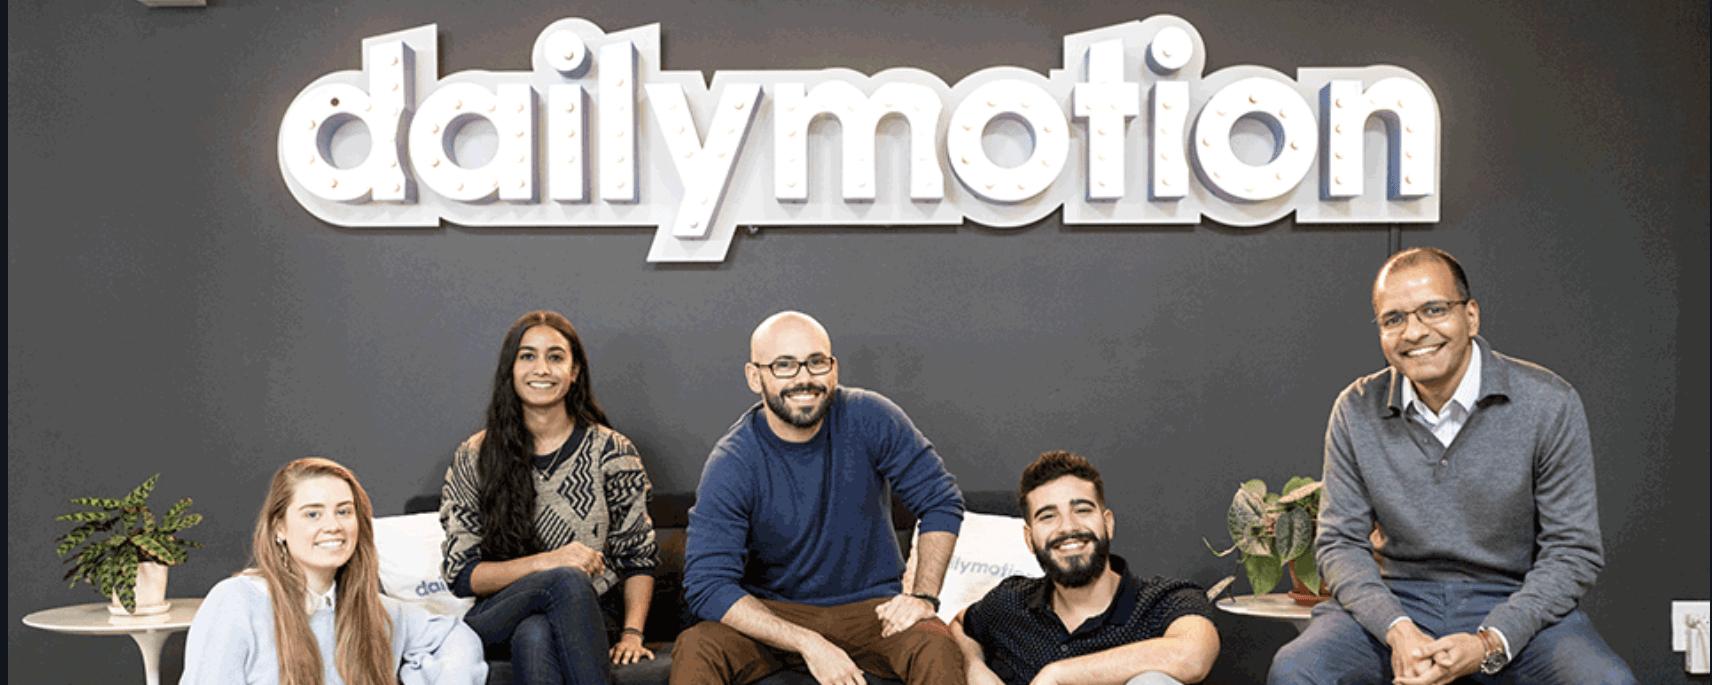 Dailymotion Customer Service Story | Zendesk